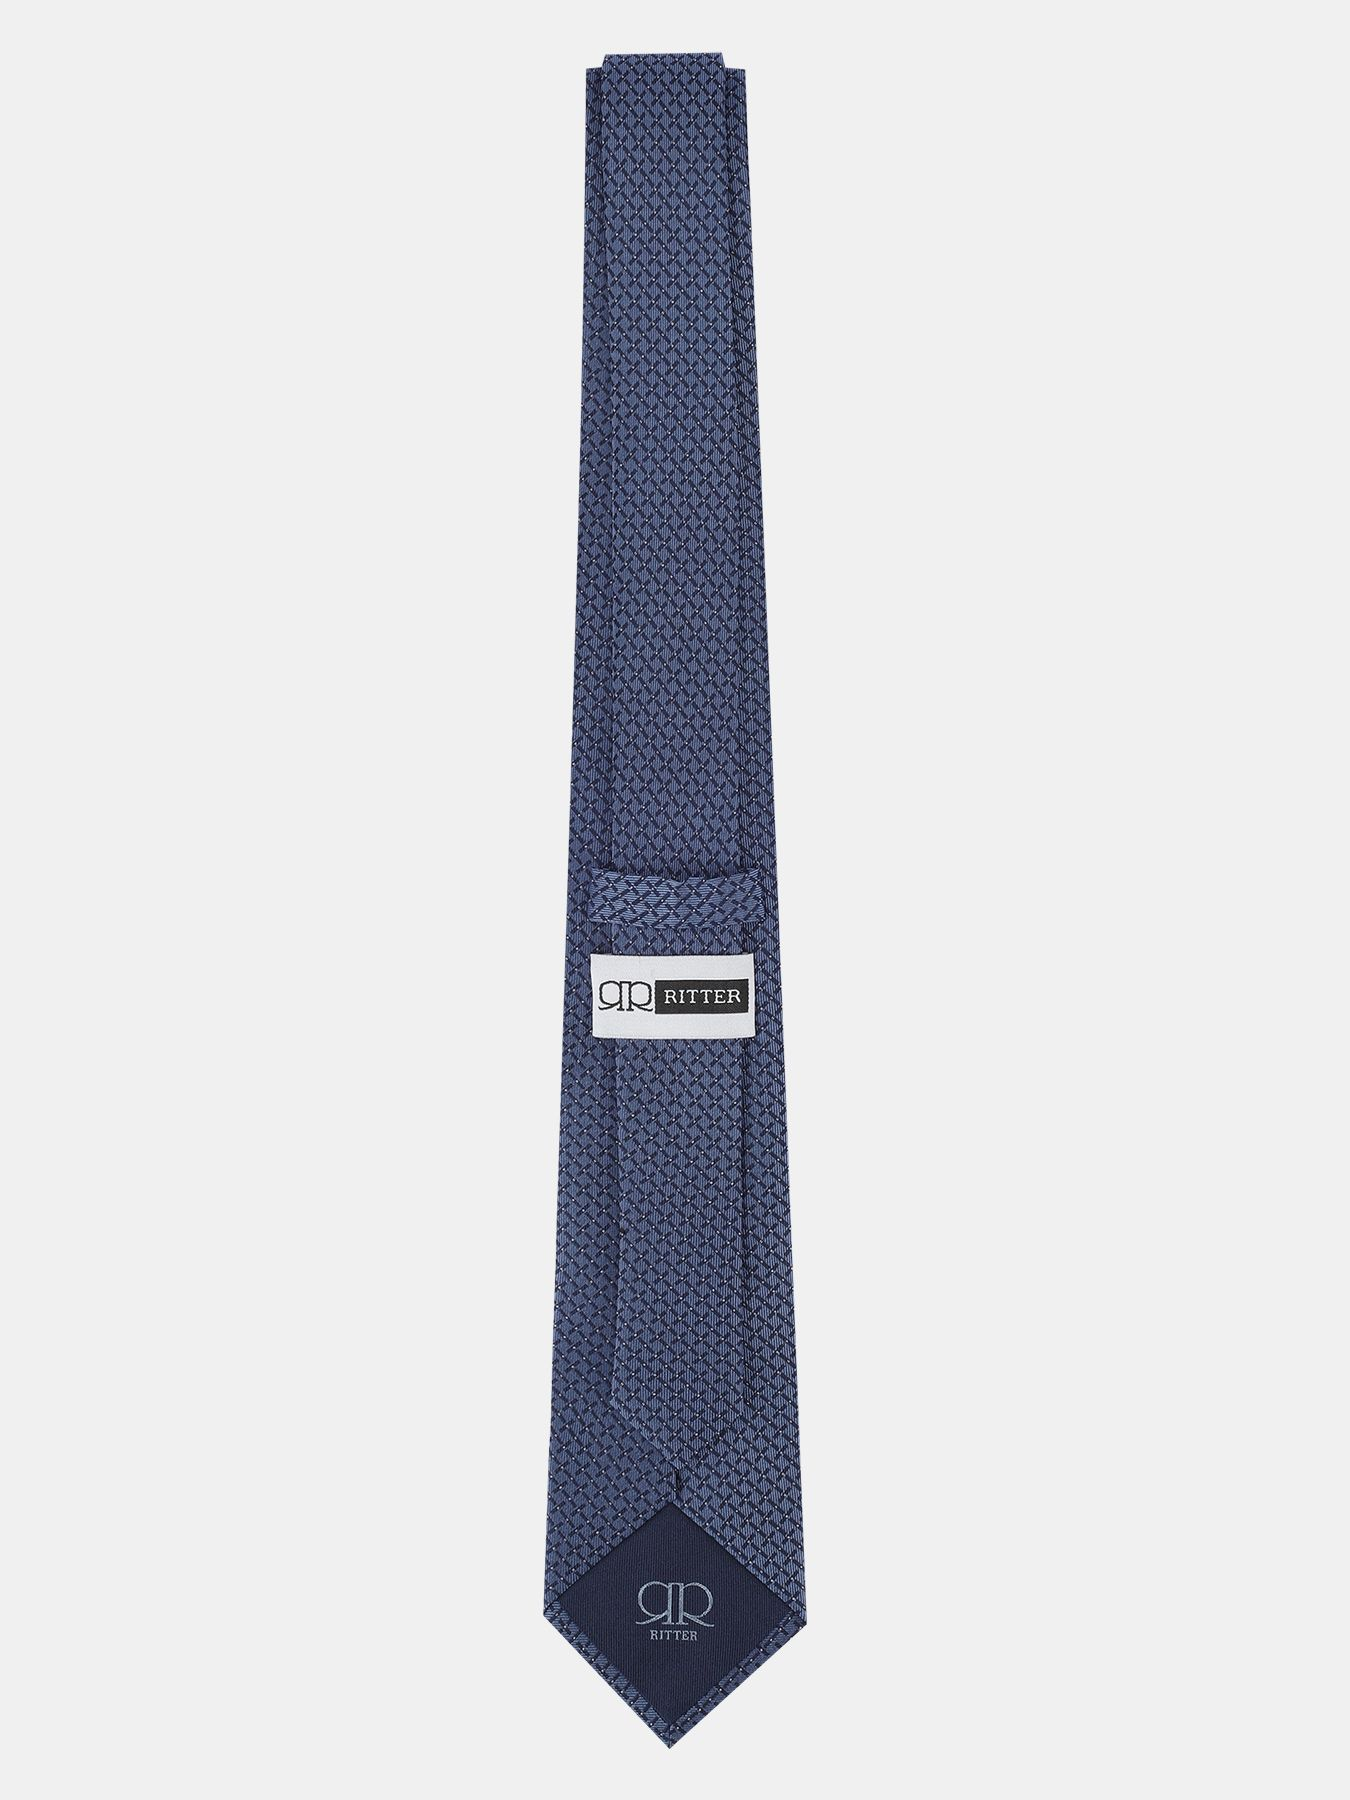 Ritter Шелковый галстук 357935-185 Фото 2